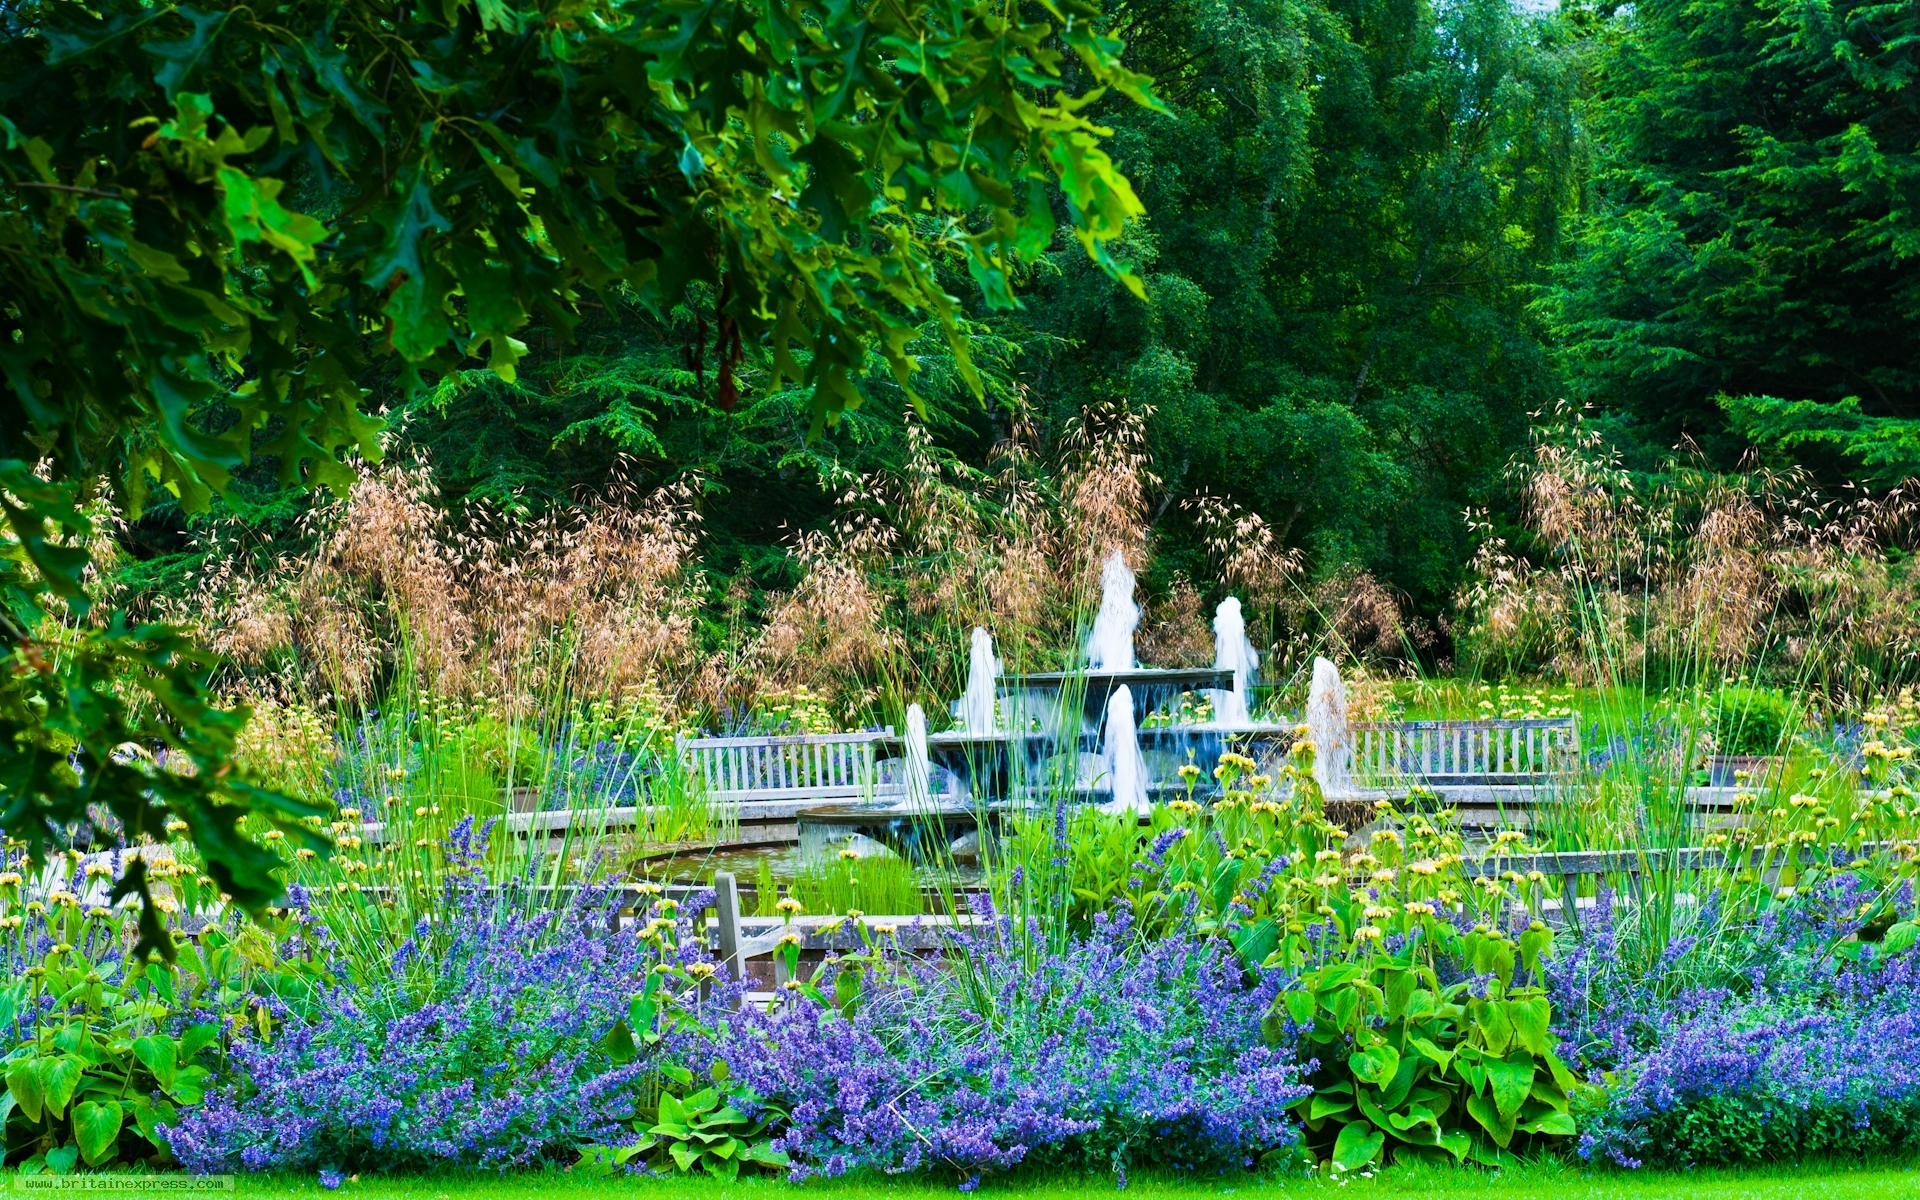 garden wallpaper zen 1920x1080px - photo #30